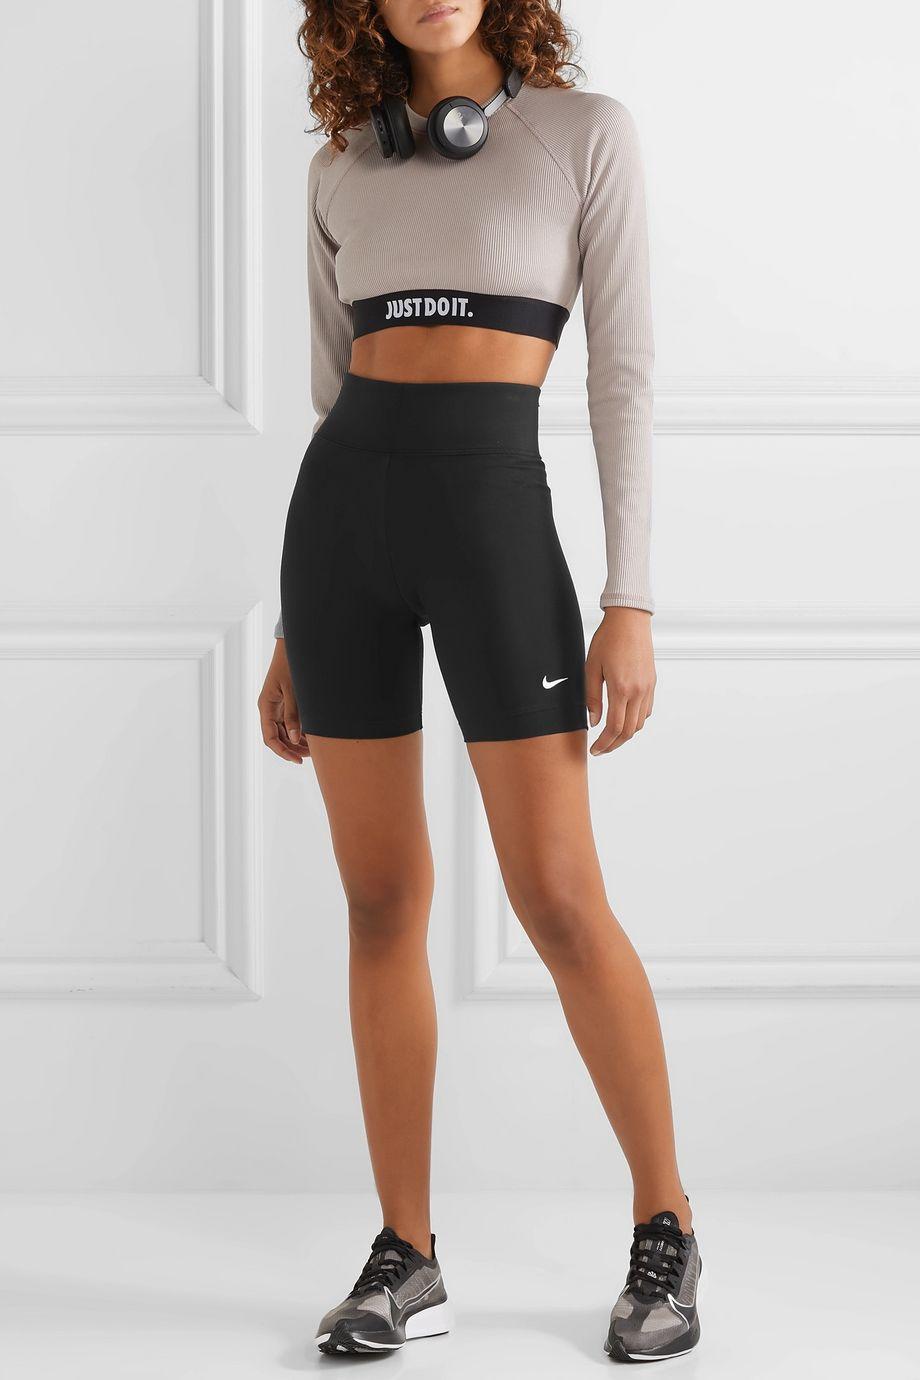 Nike Leg-A-See stretch cotton-blend jersey shorts